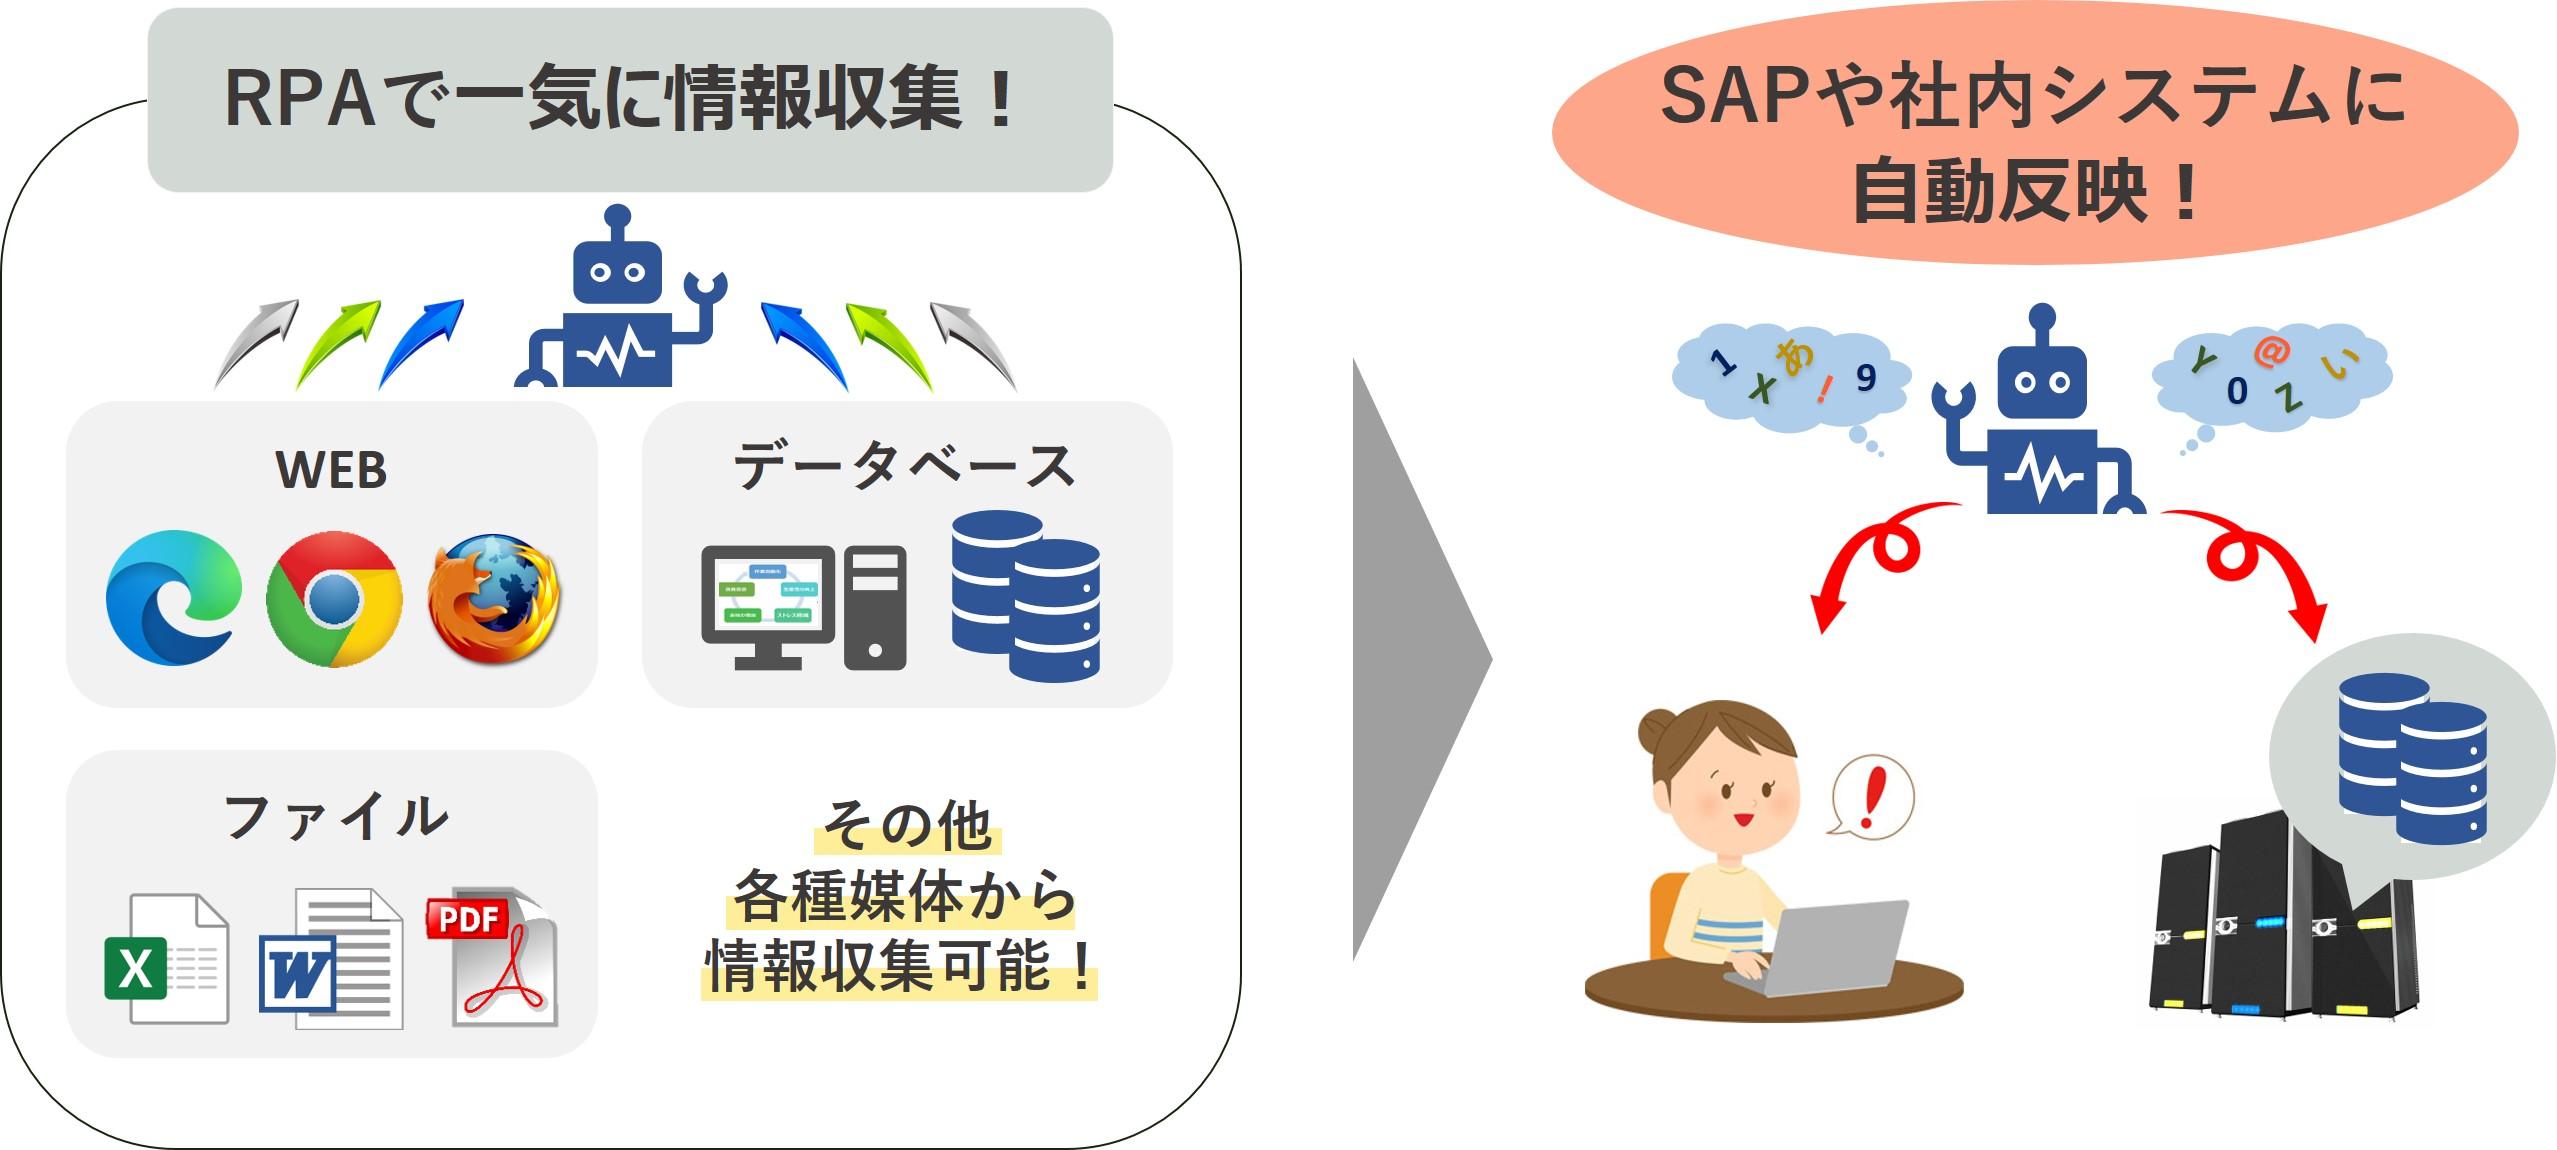 NDK-RPA-AI-OCR-入力作業効率化-事例